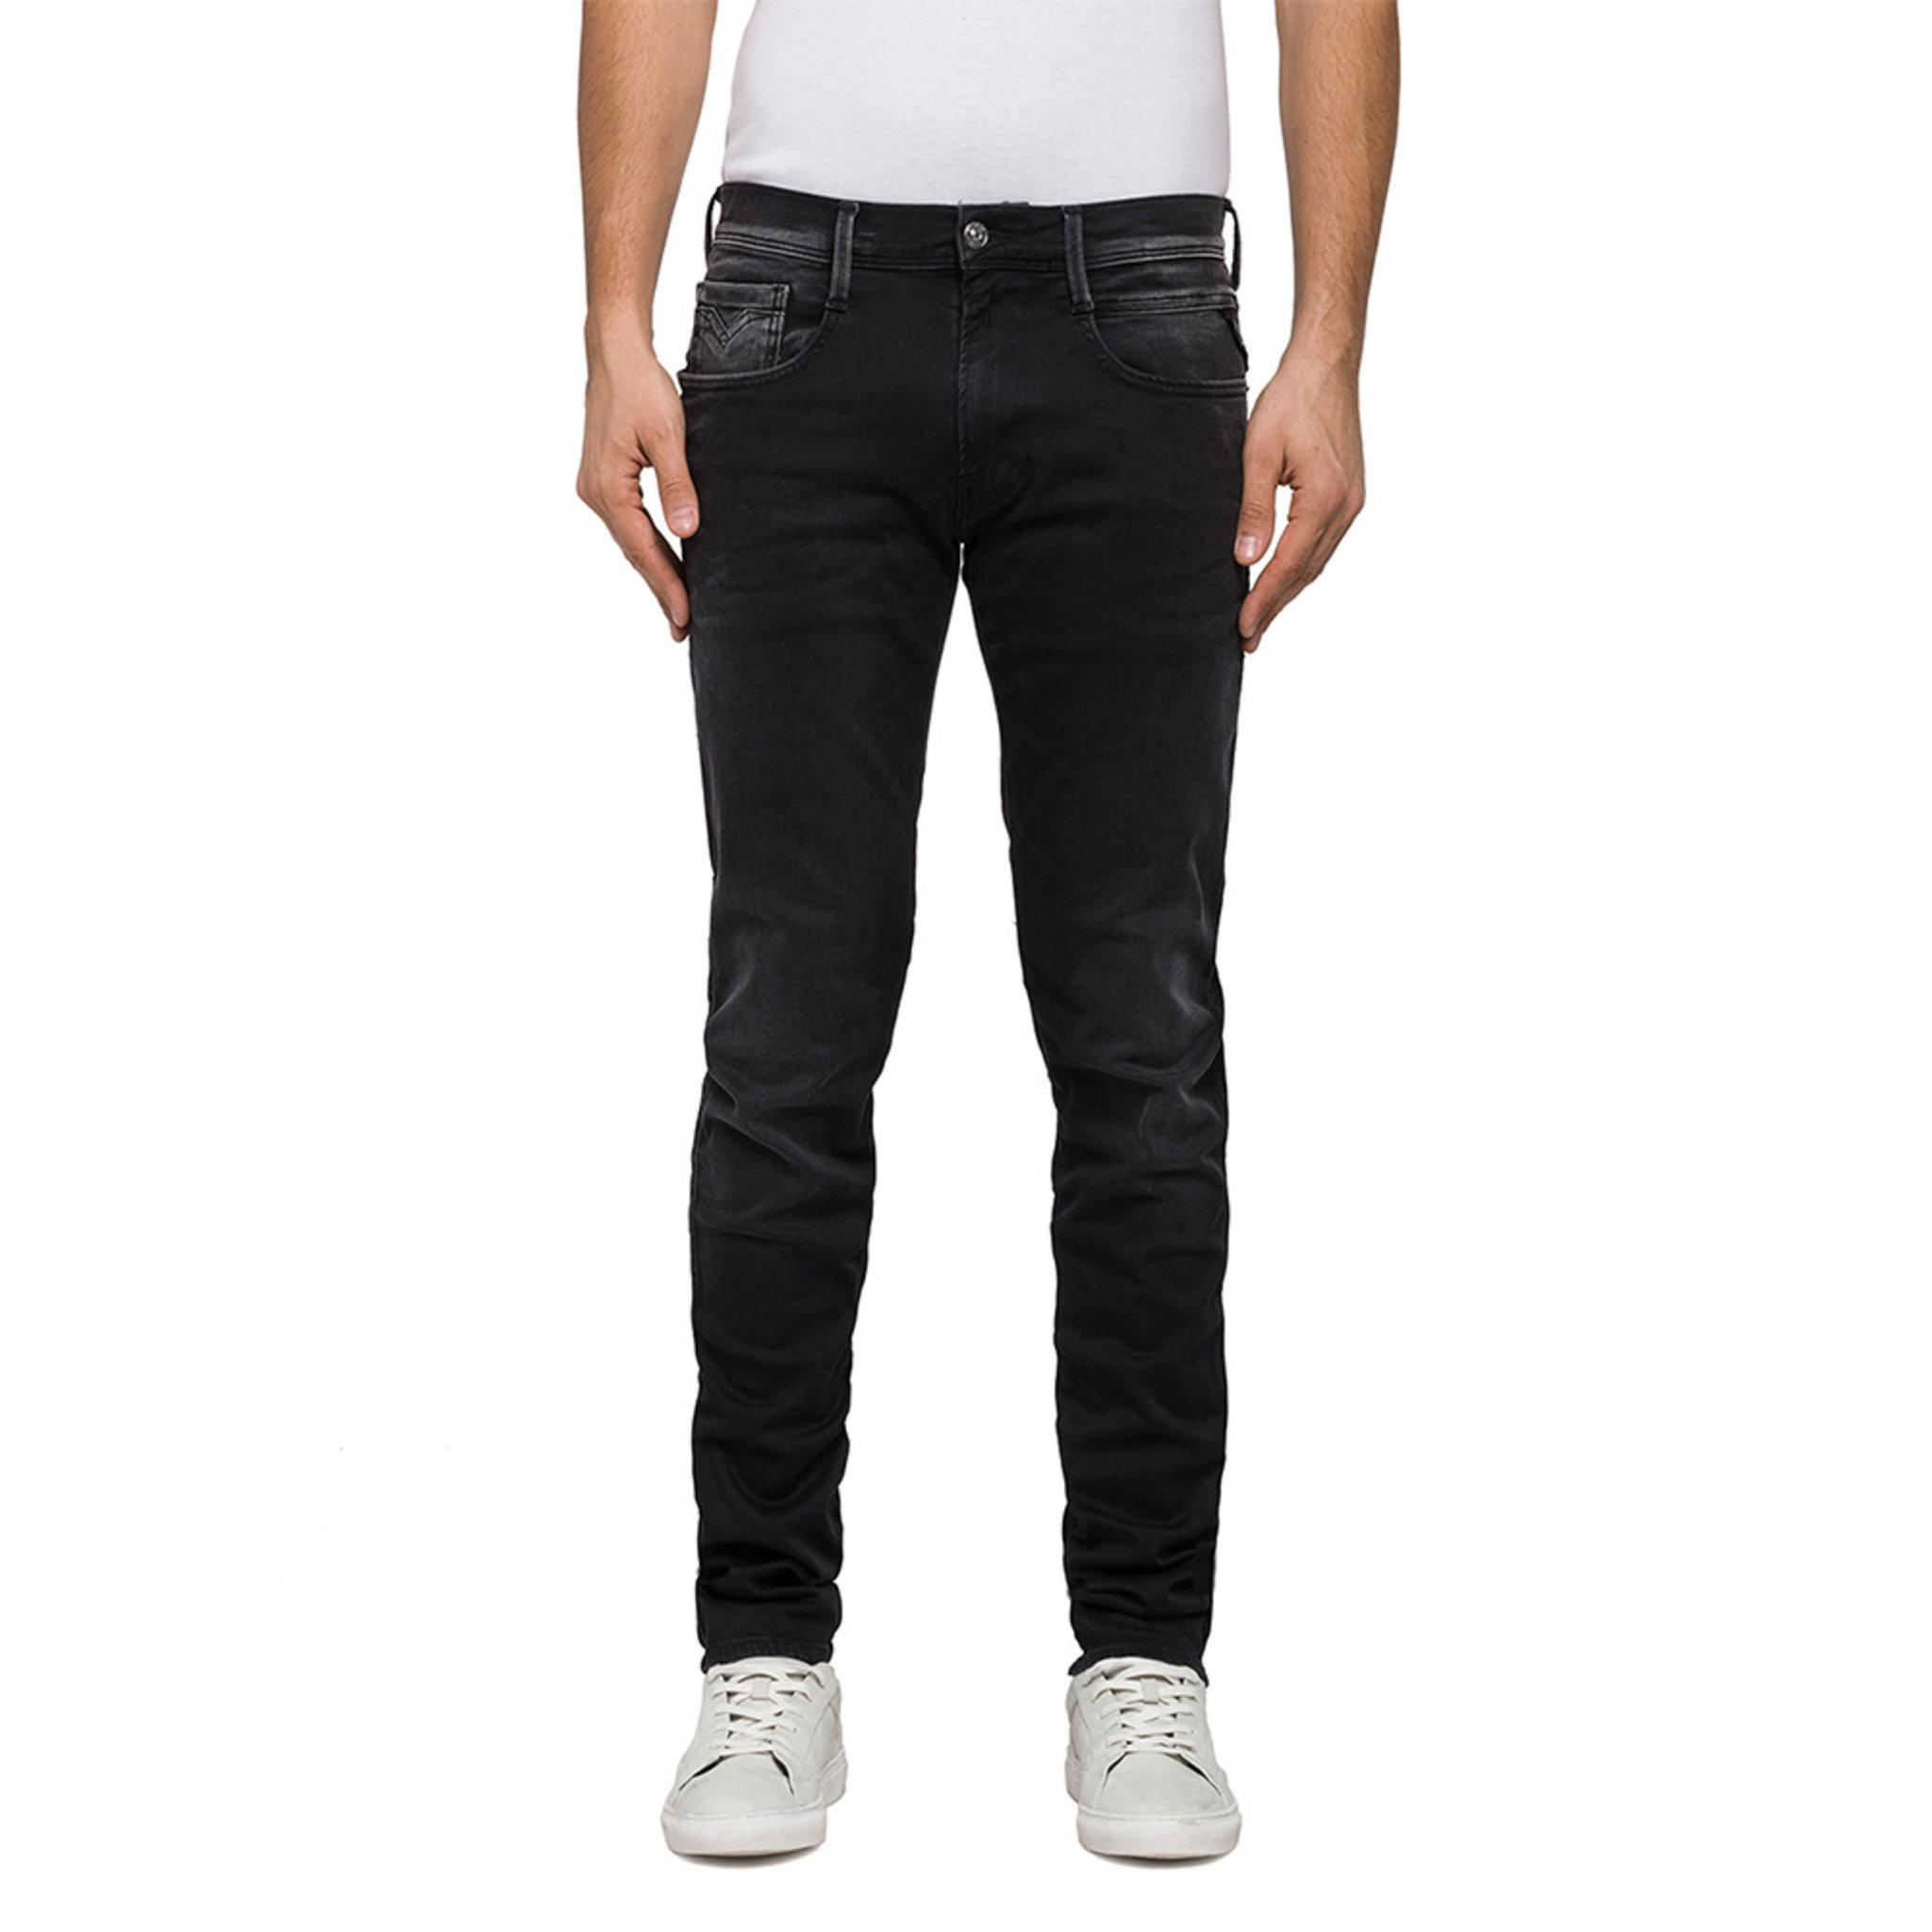 a7c52eca901 Anbass Hyperflex Slim Fit Jeans - Byxor & Jeans - Köp online på åhlens.se!